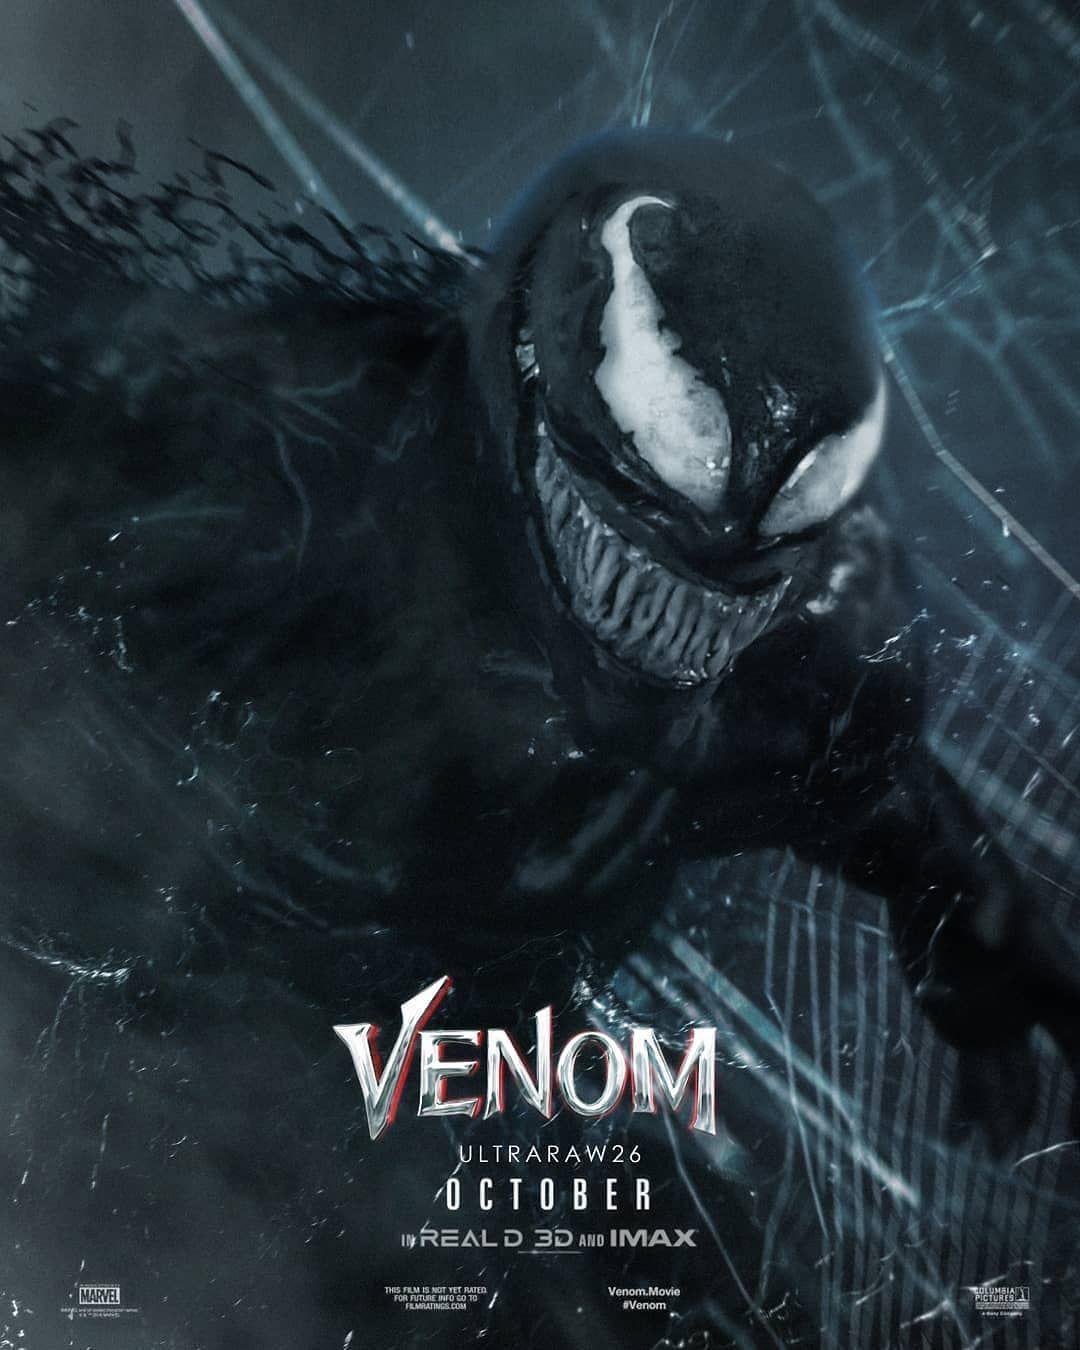 Venom Tomhardy Tomhardyisvenom Sony Spiderman Movies Marvel Movies2018 Comics Avengersinfinitywar Avengers Comic To Venom Venom Movie Marvel Venom